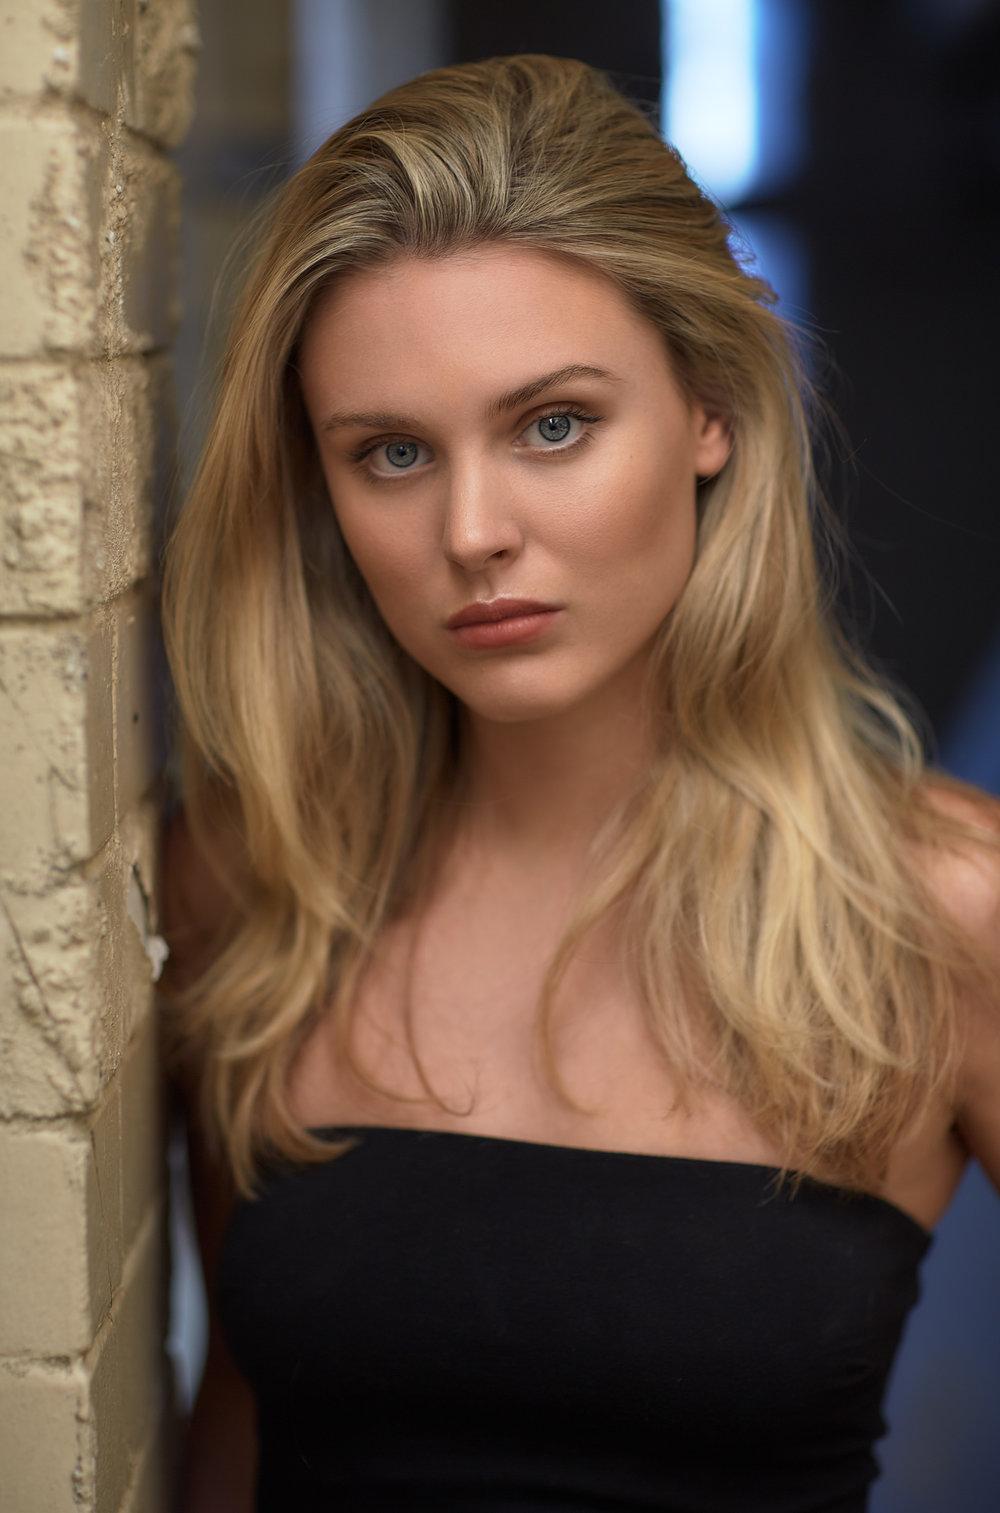 Nick Prokop Photography sydney headshot photogrtapher nsw australia actor casting.jpg